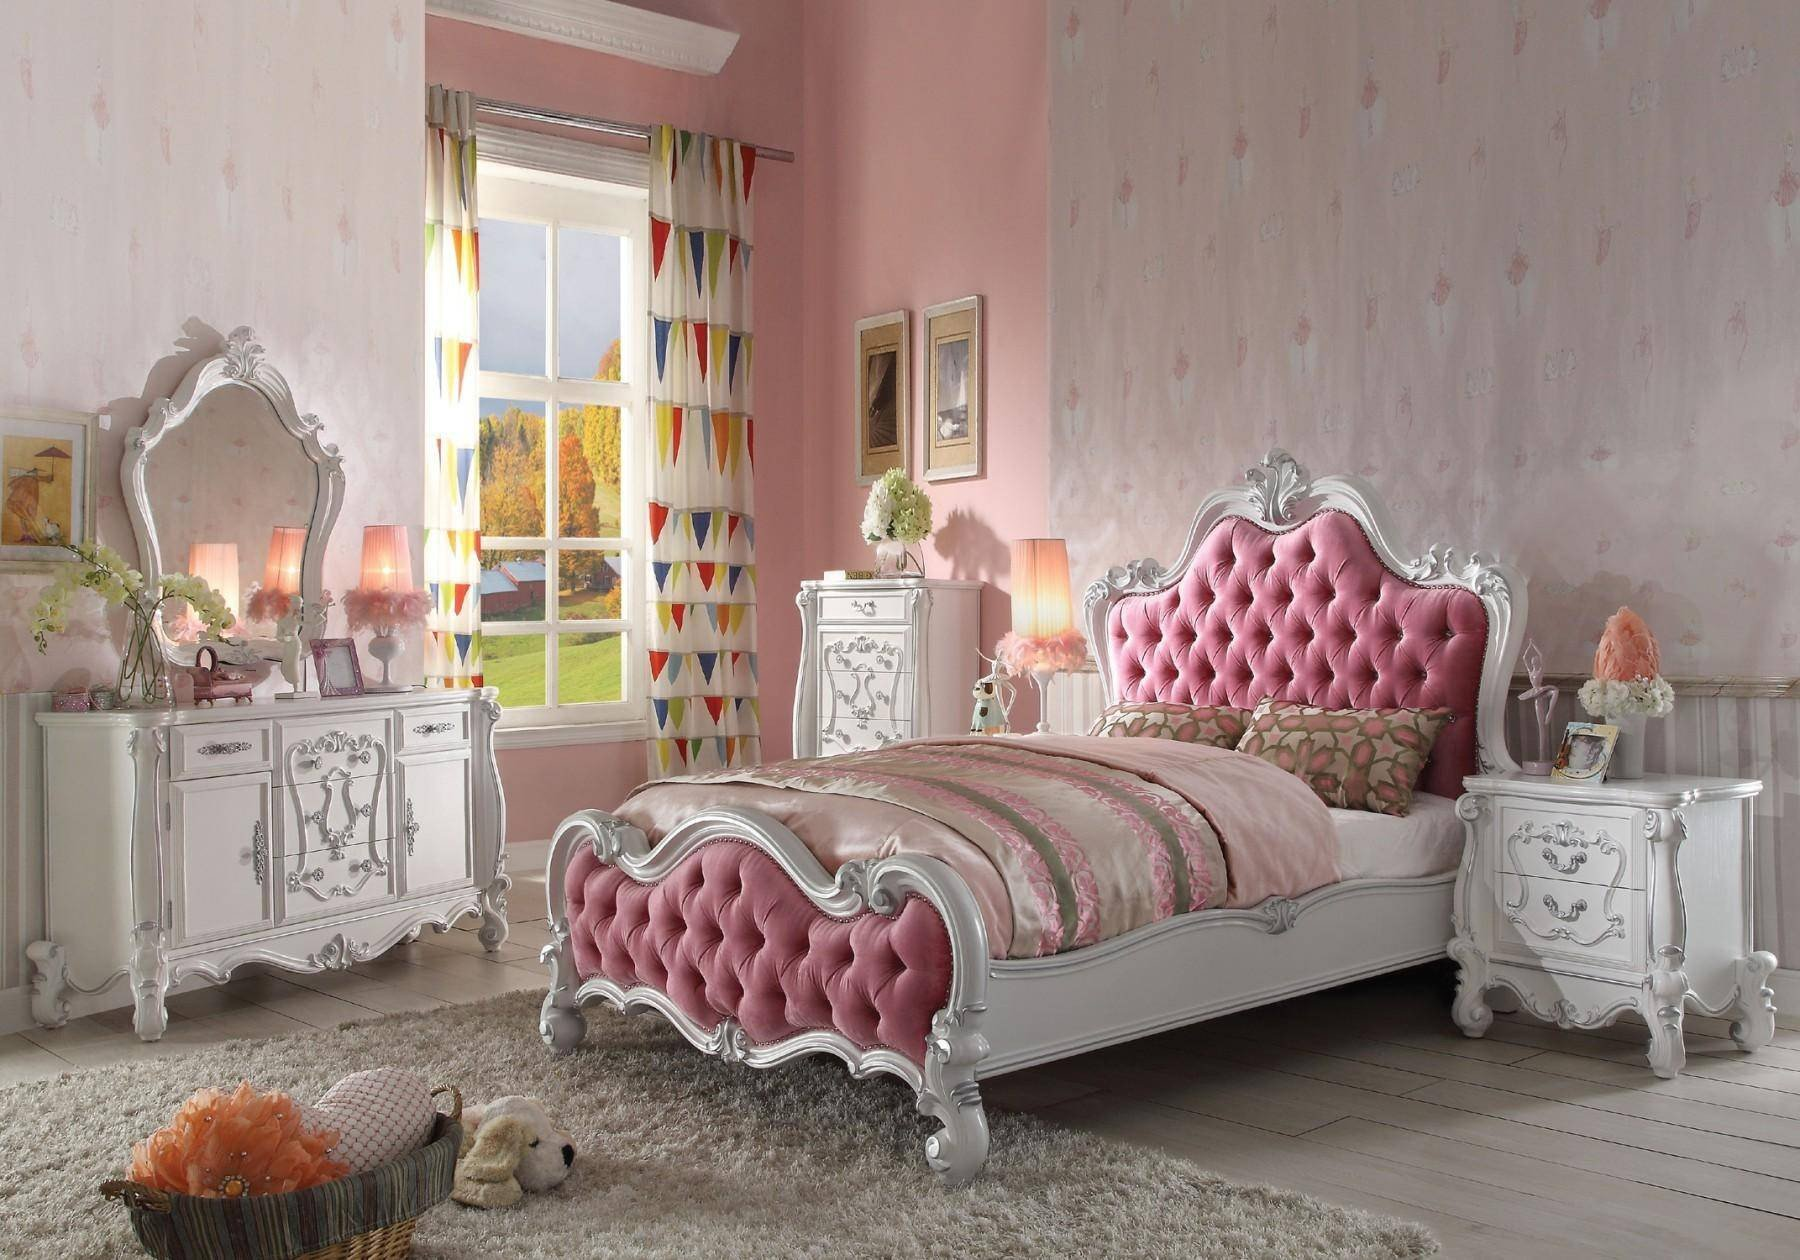 Cheap Childrens Bedroom Set Best Of soflex Classic andria Kids Queen Bedroom Set 4pcs Antique